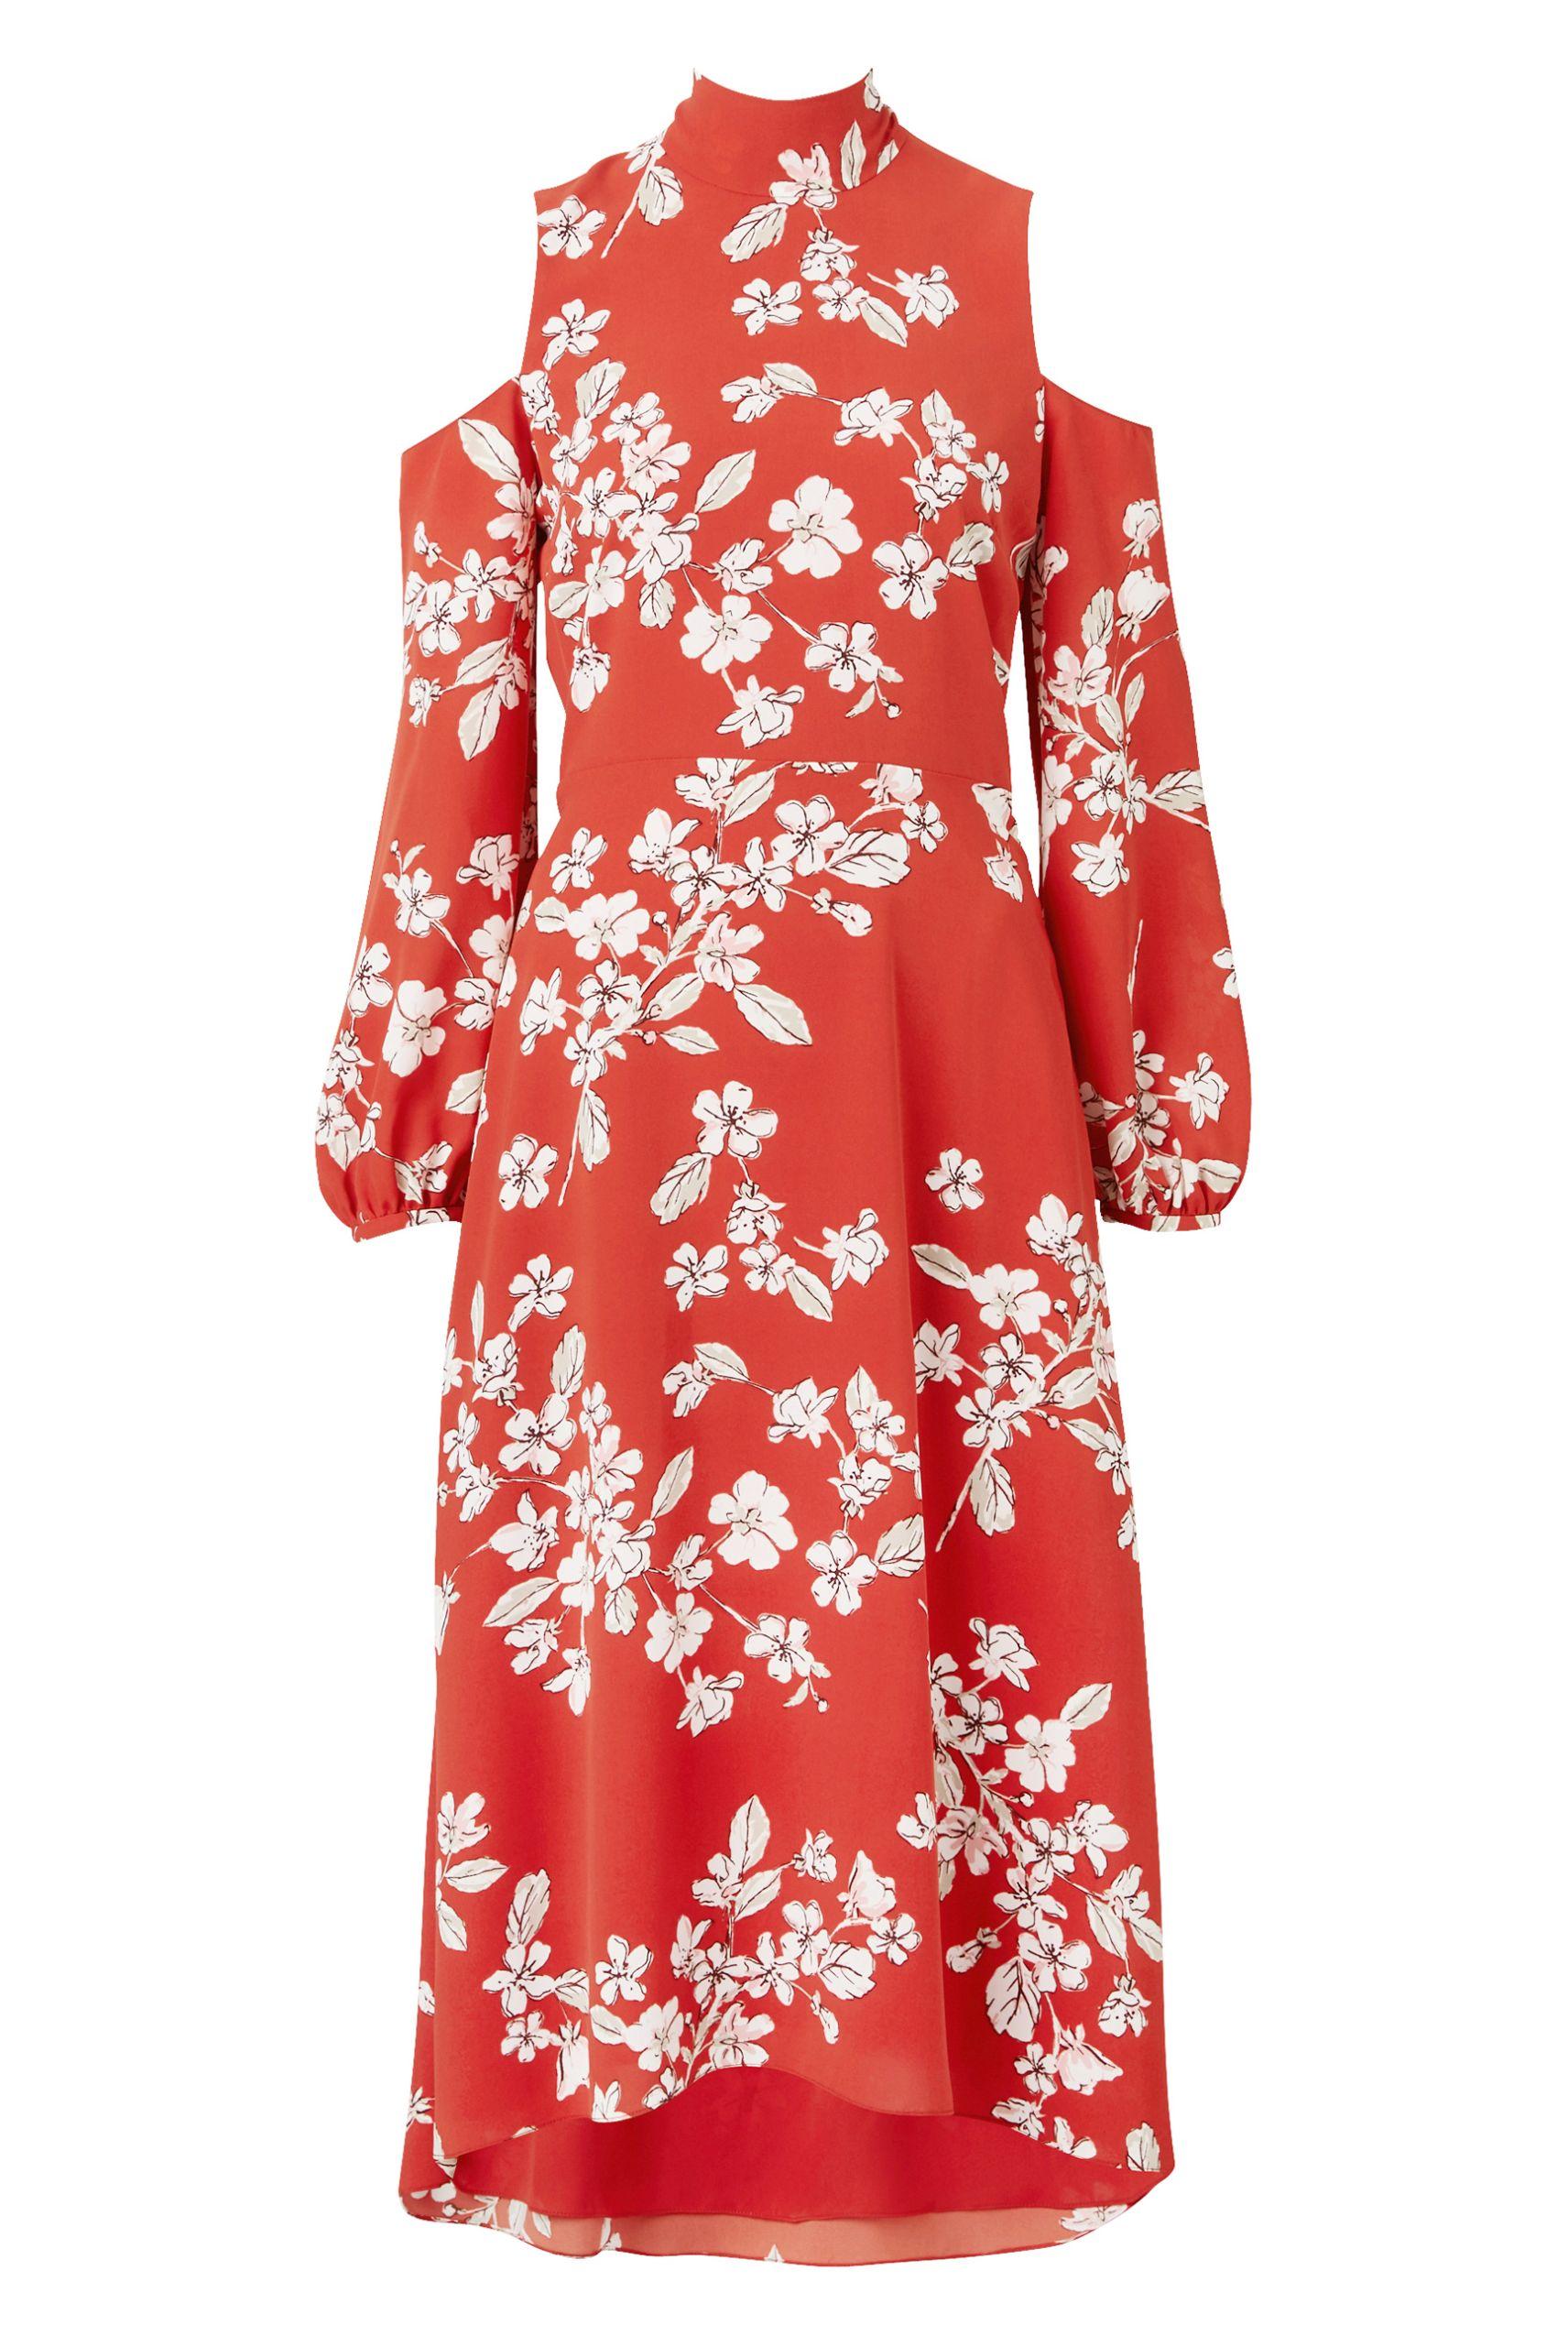 60212360_Witchery Eastern Bloom Dress, RRP$179.90